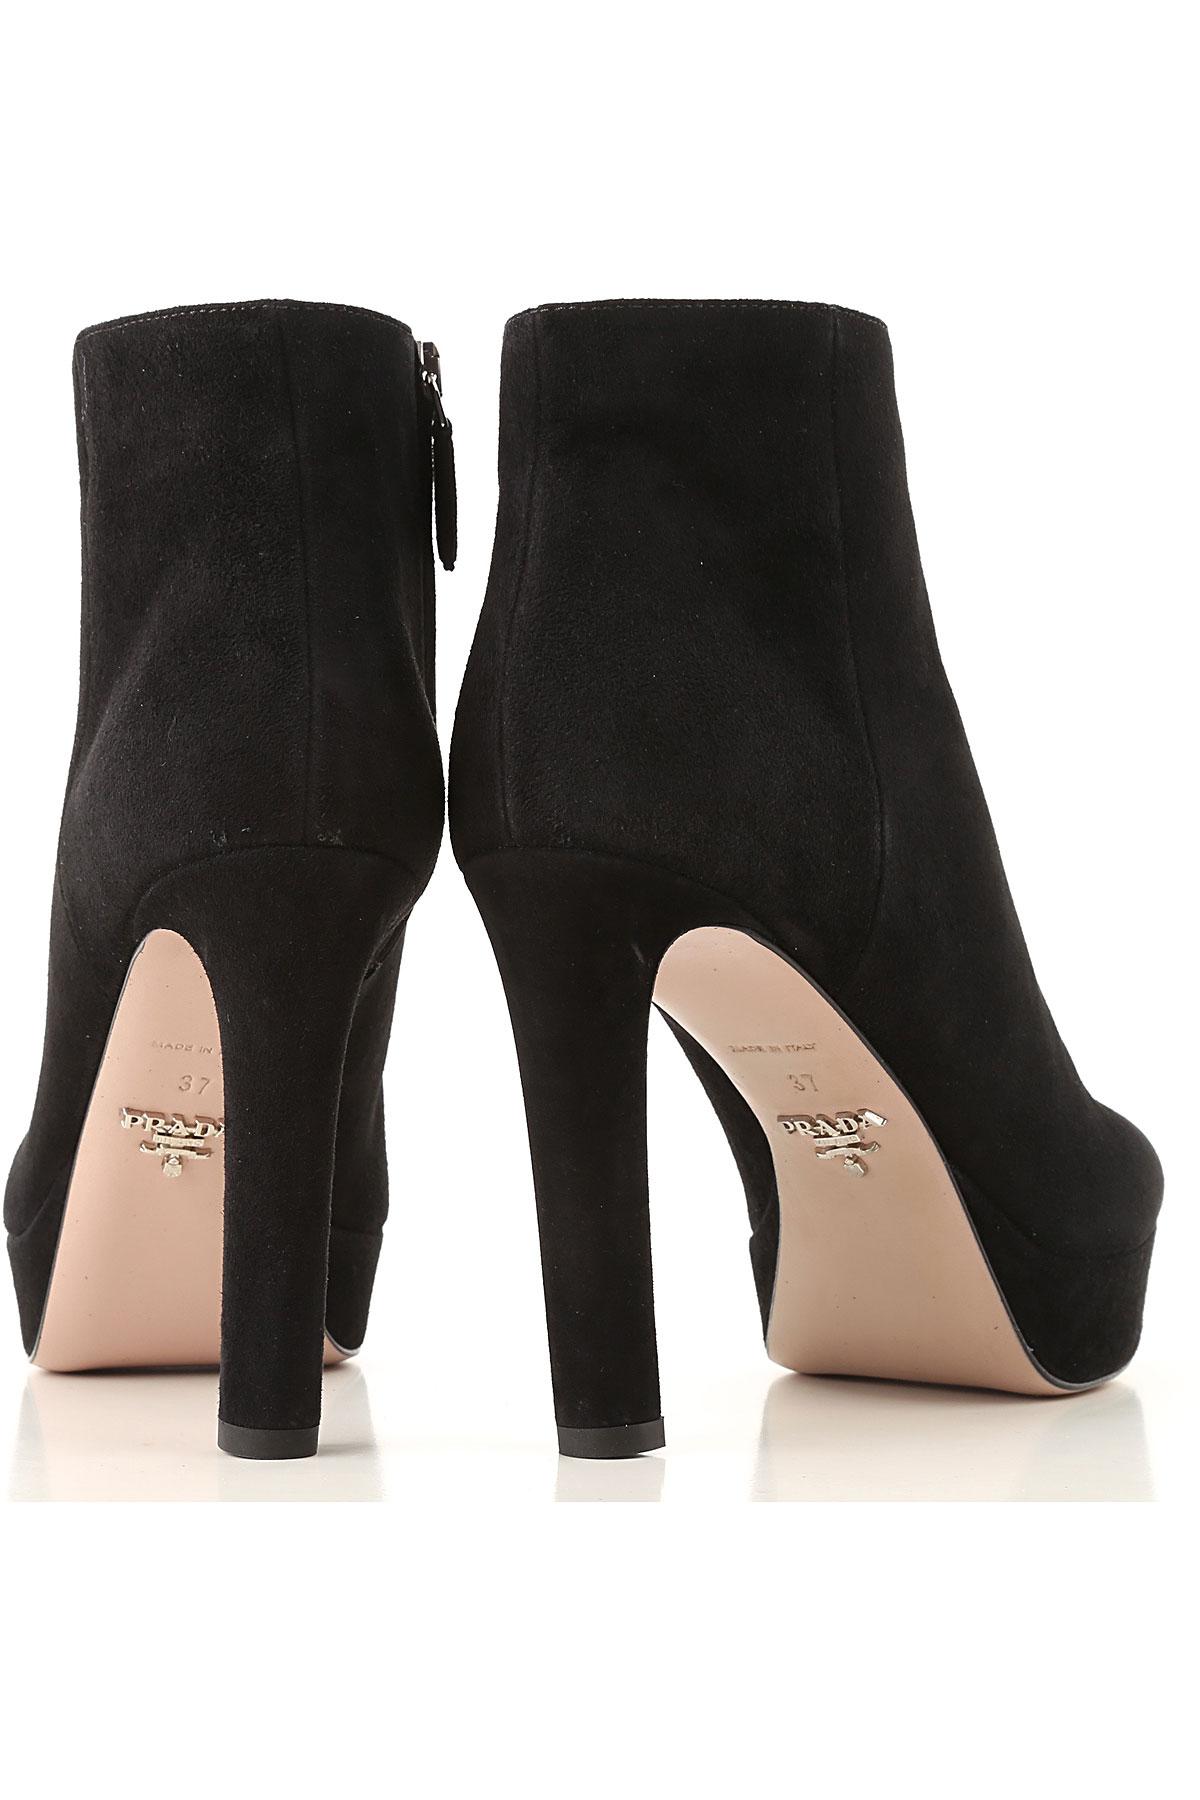 Negro nbsp; Prada Otoño Mujer invierno 19 Zapatos 2018 Para xTfTq0vw1